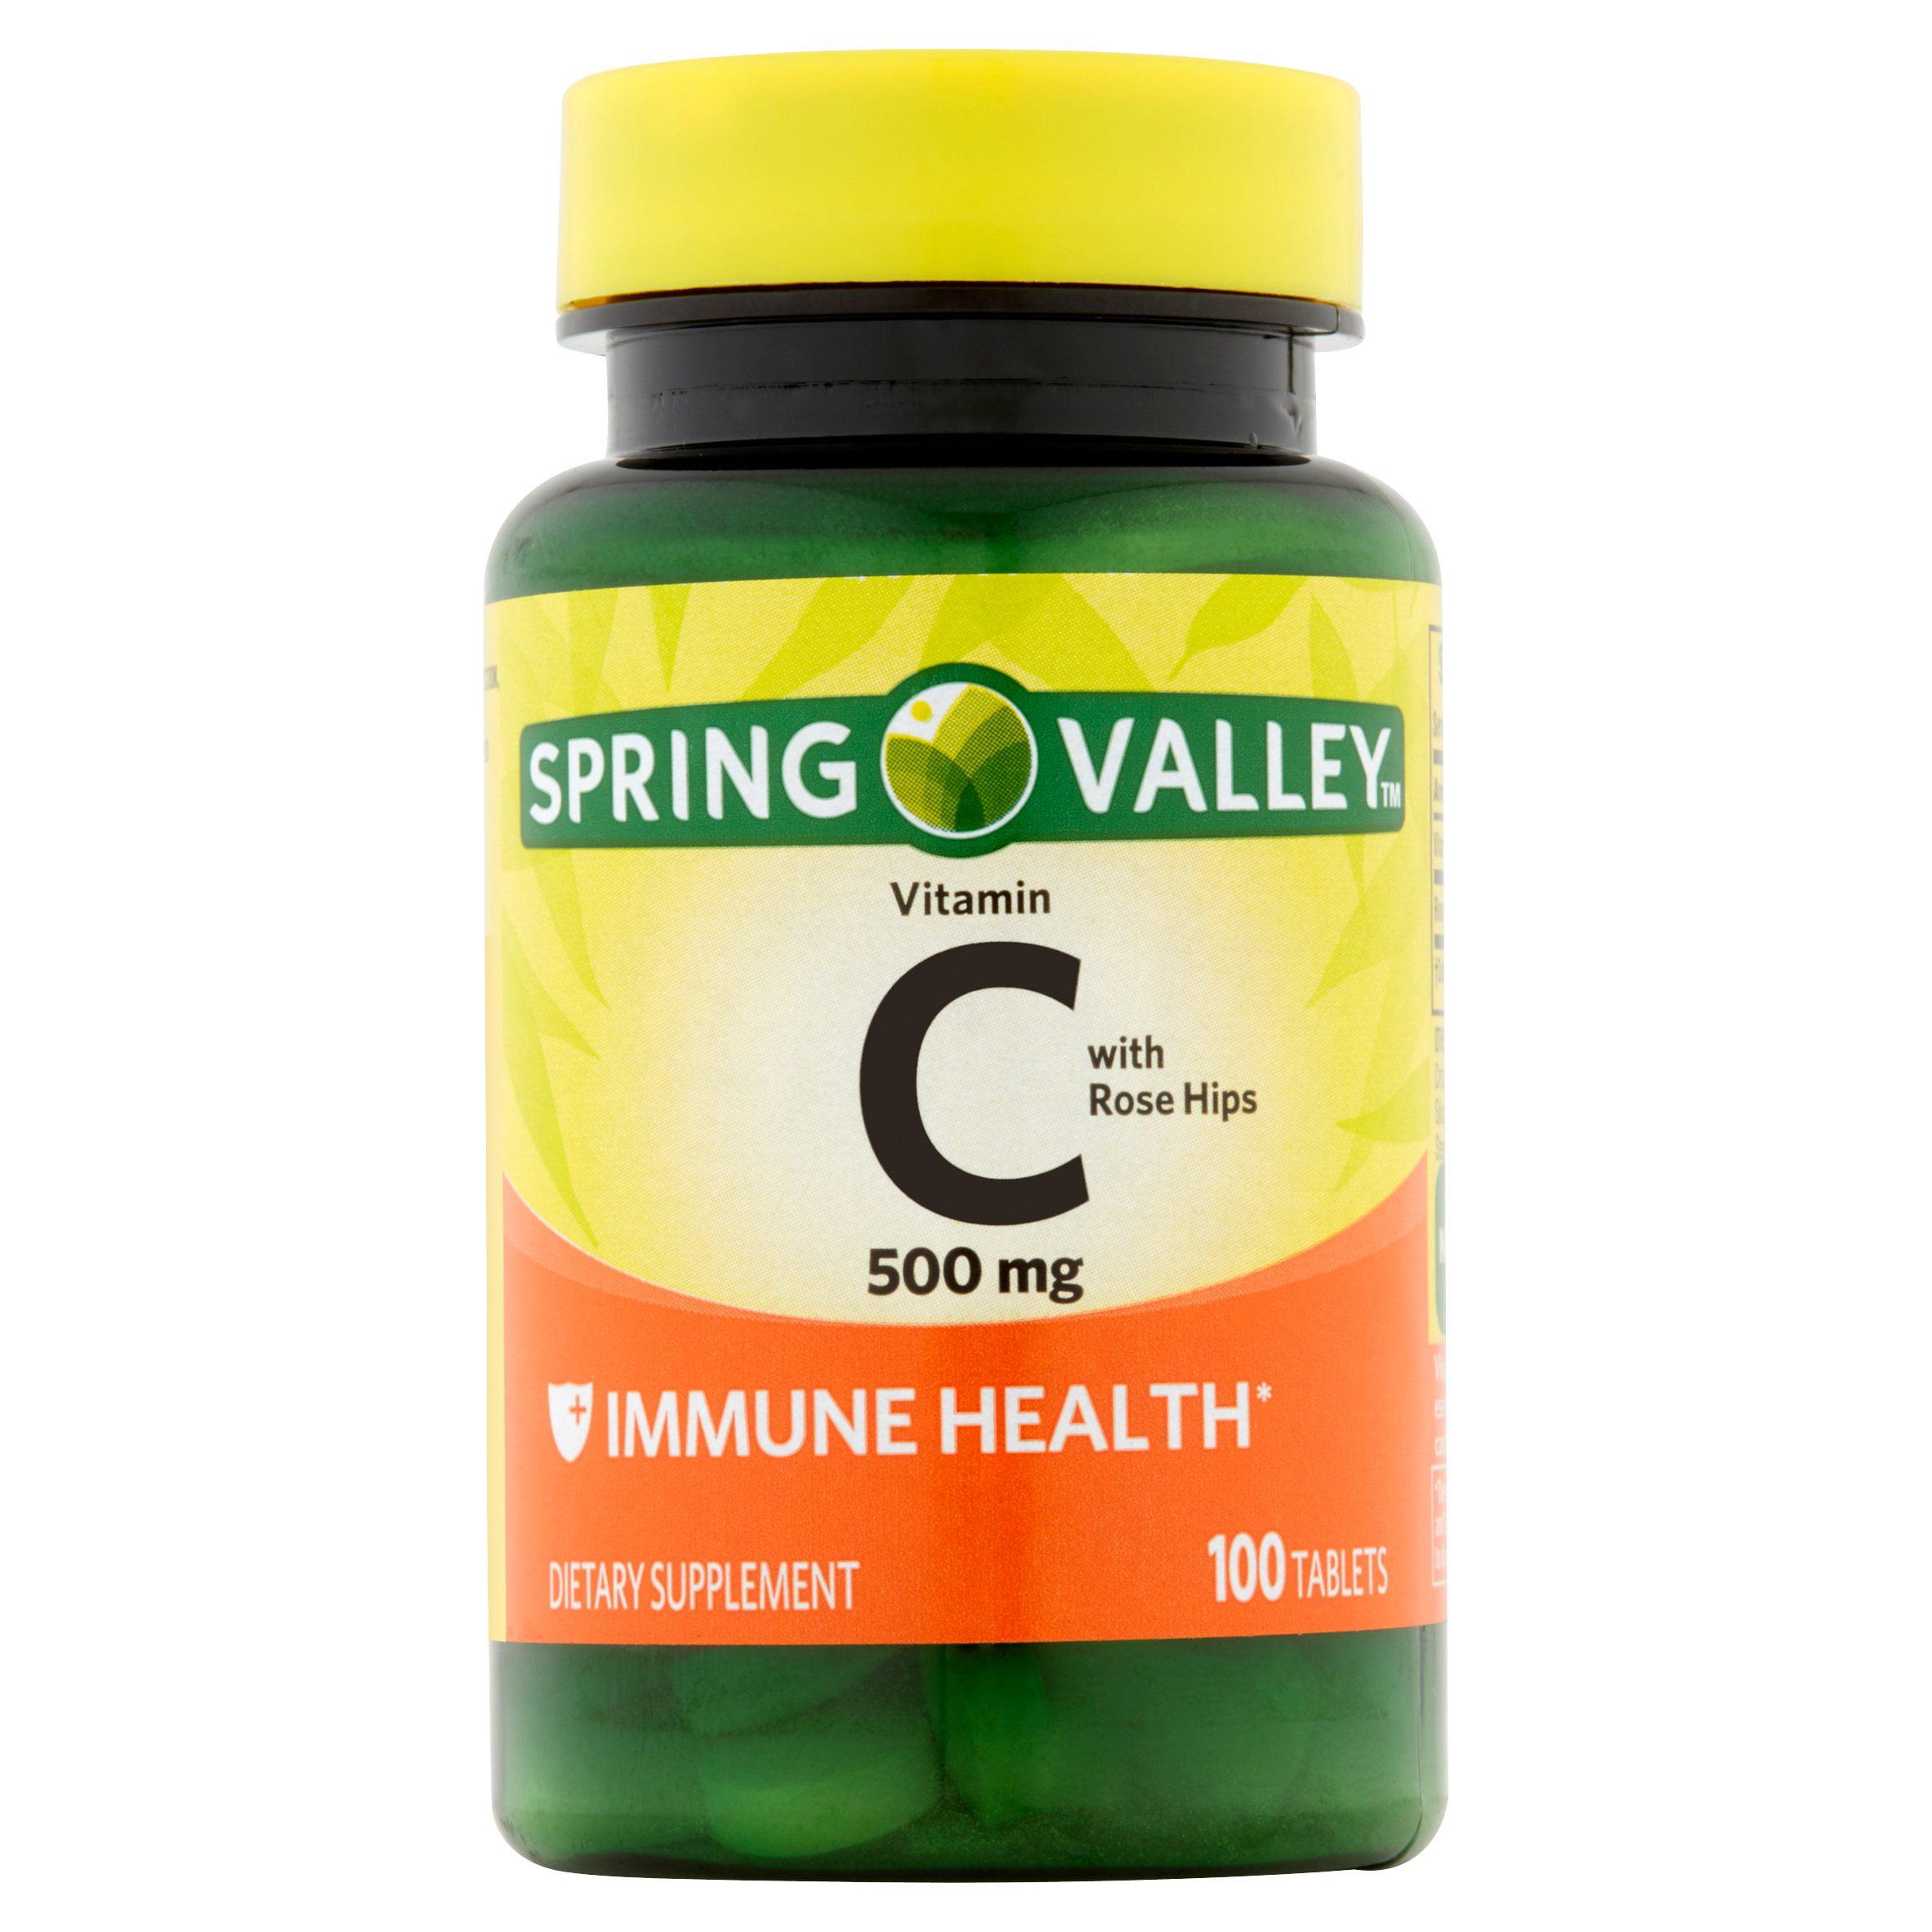 Spring Valley Vitamin C Tablets, 500 mg, 100 Ct